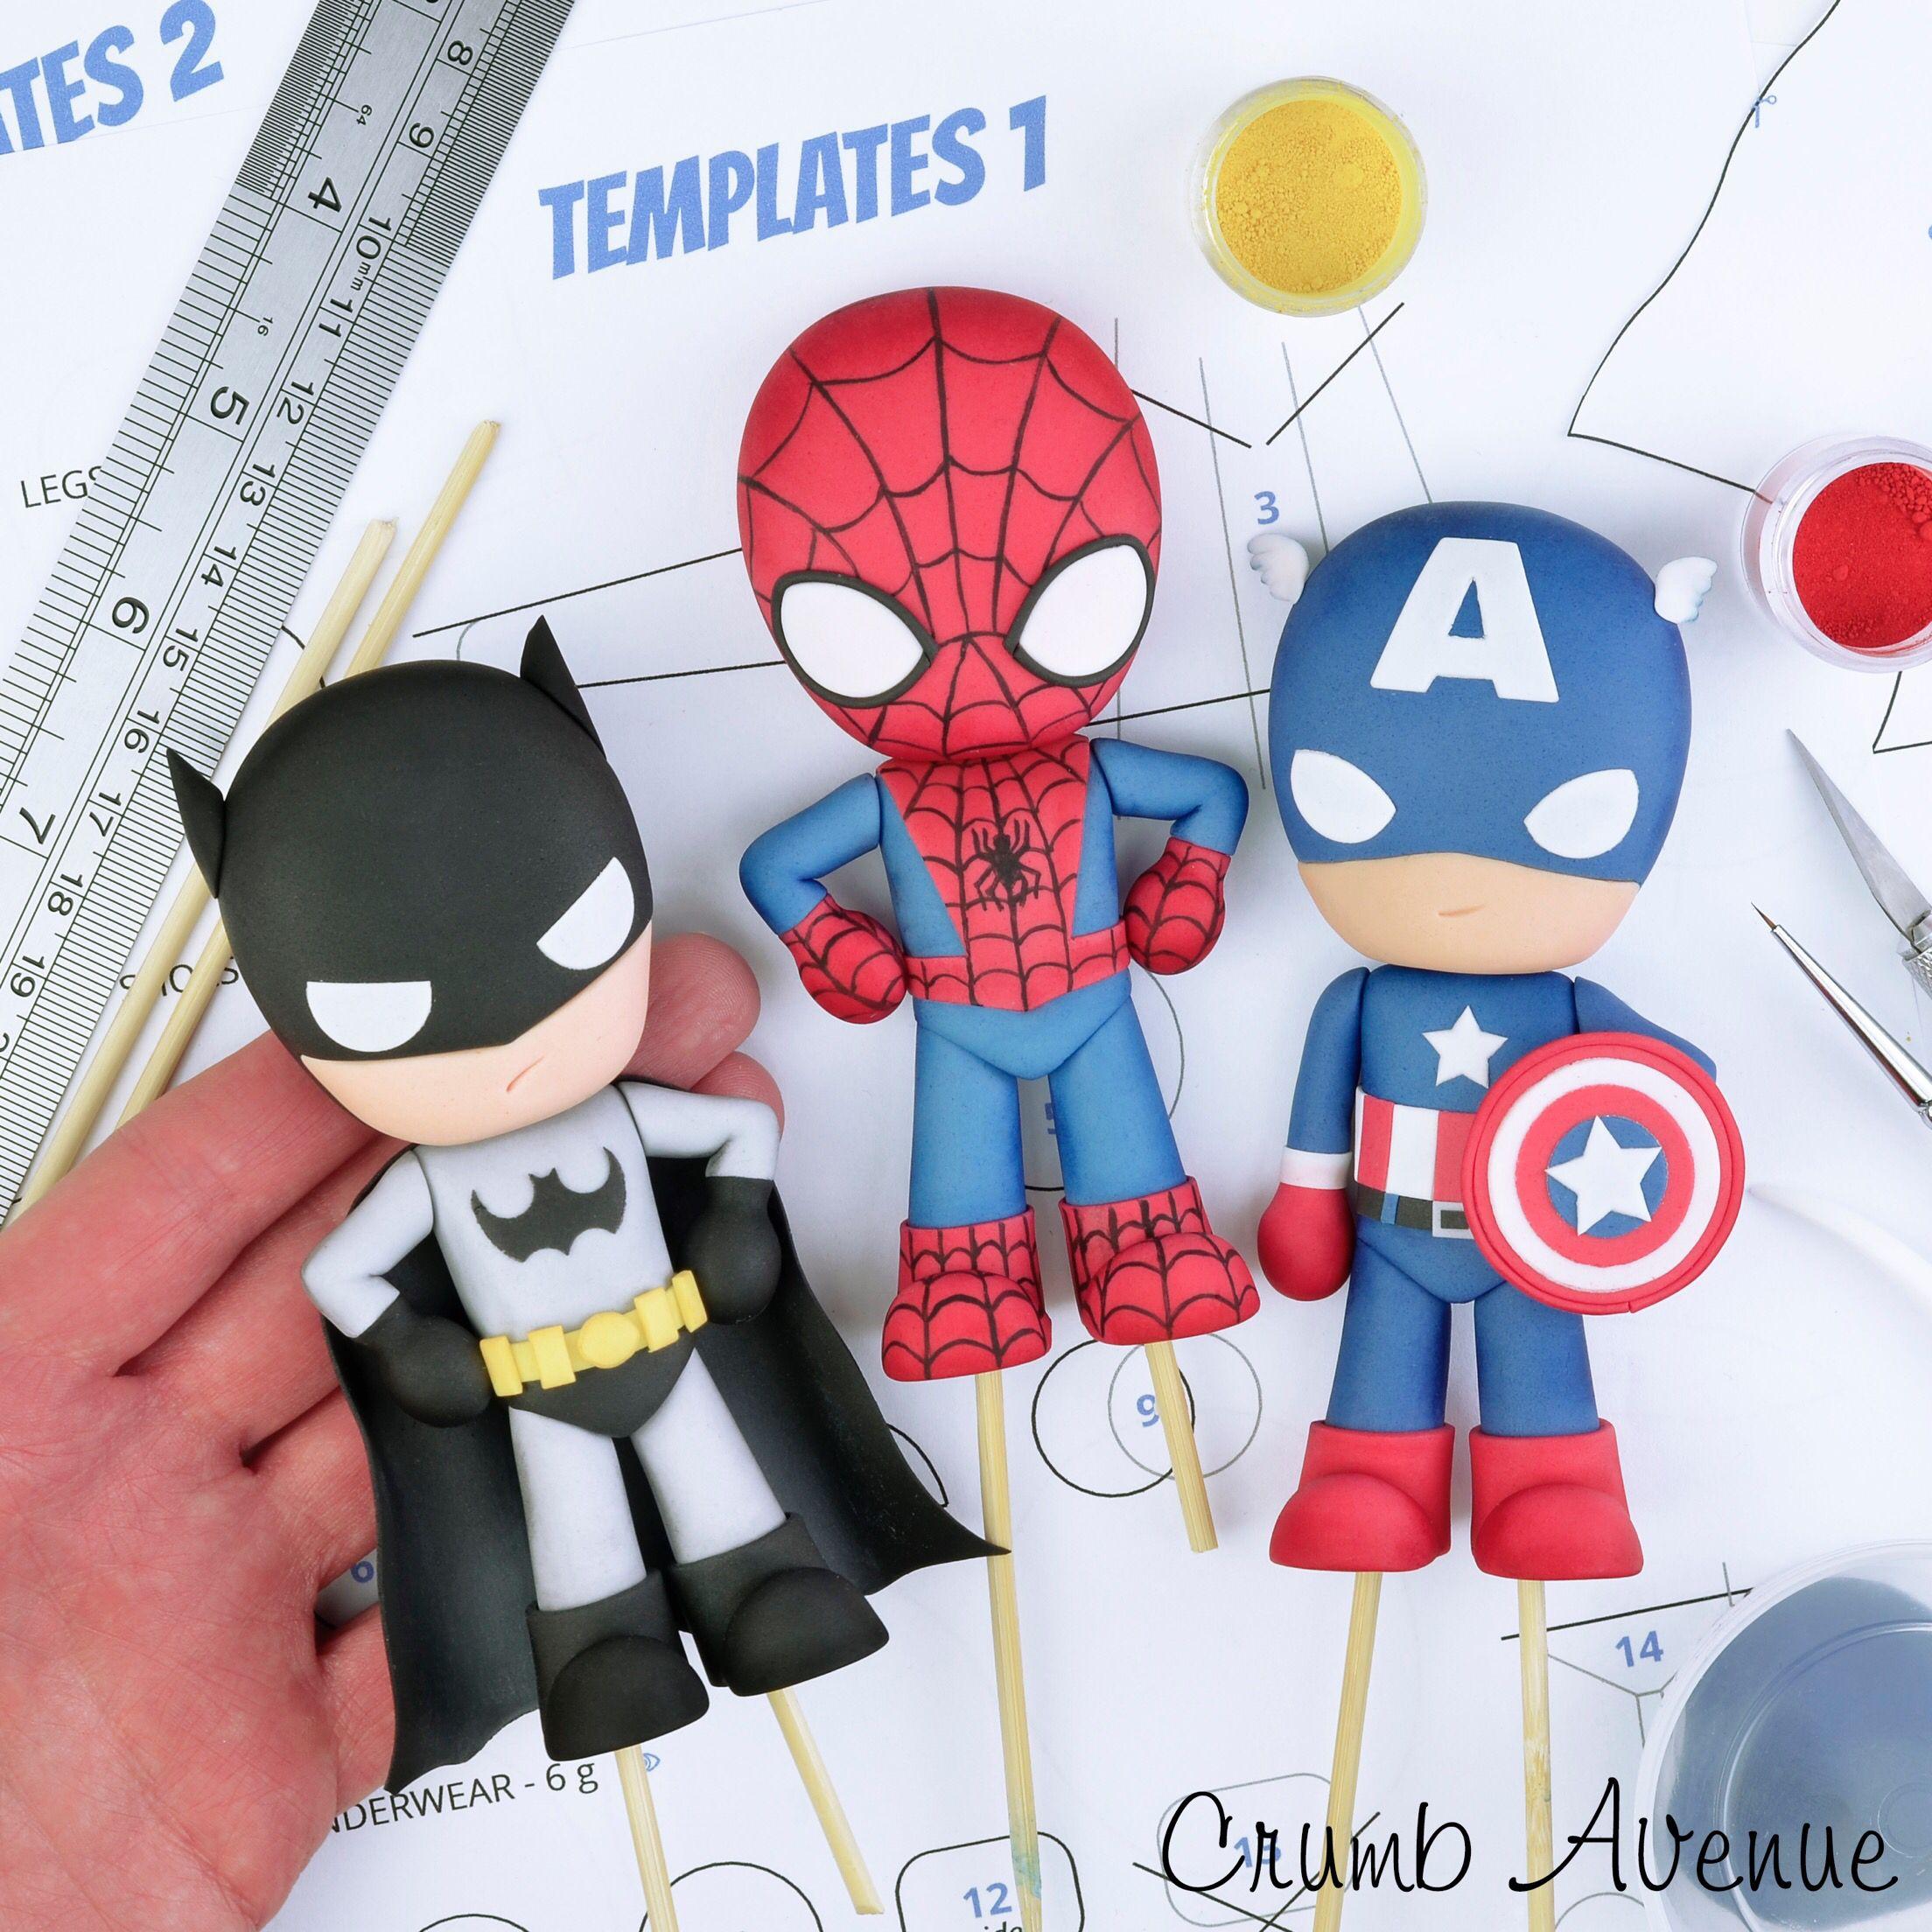 Pleasing I Used The Superhero Templates To Make Them Fondant Funny Birthday Cards Online Necthendildamsfinfo